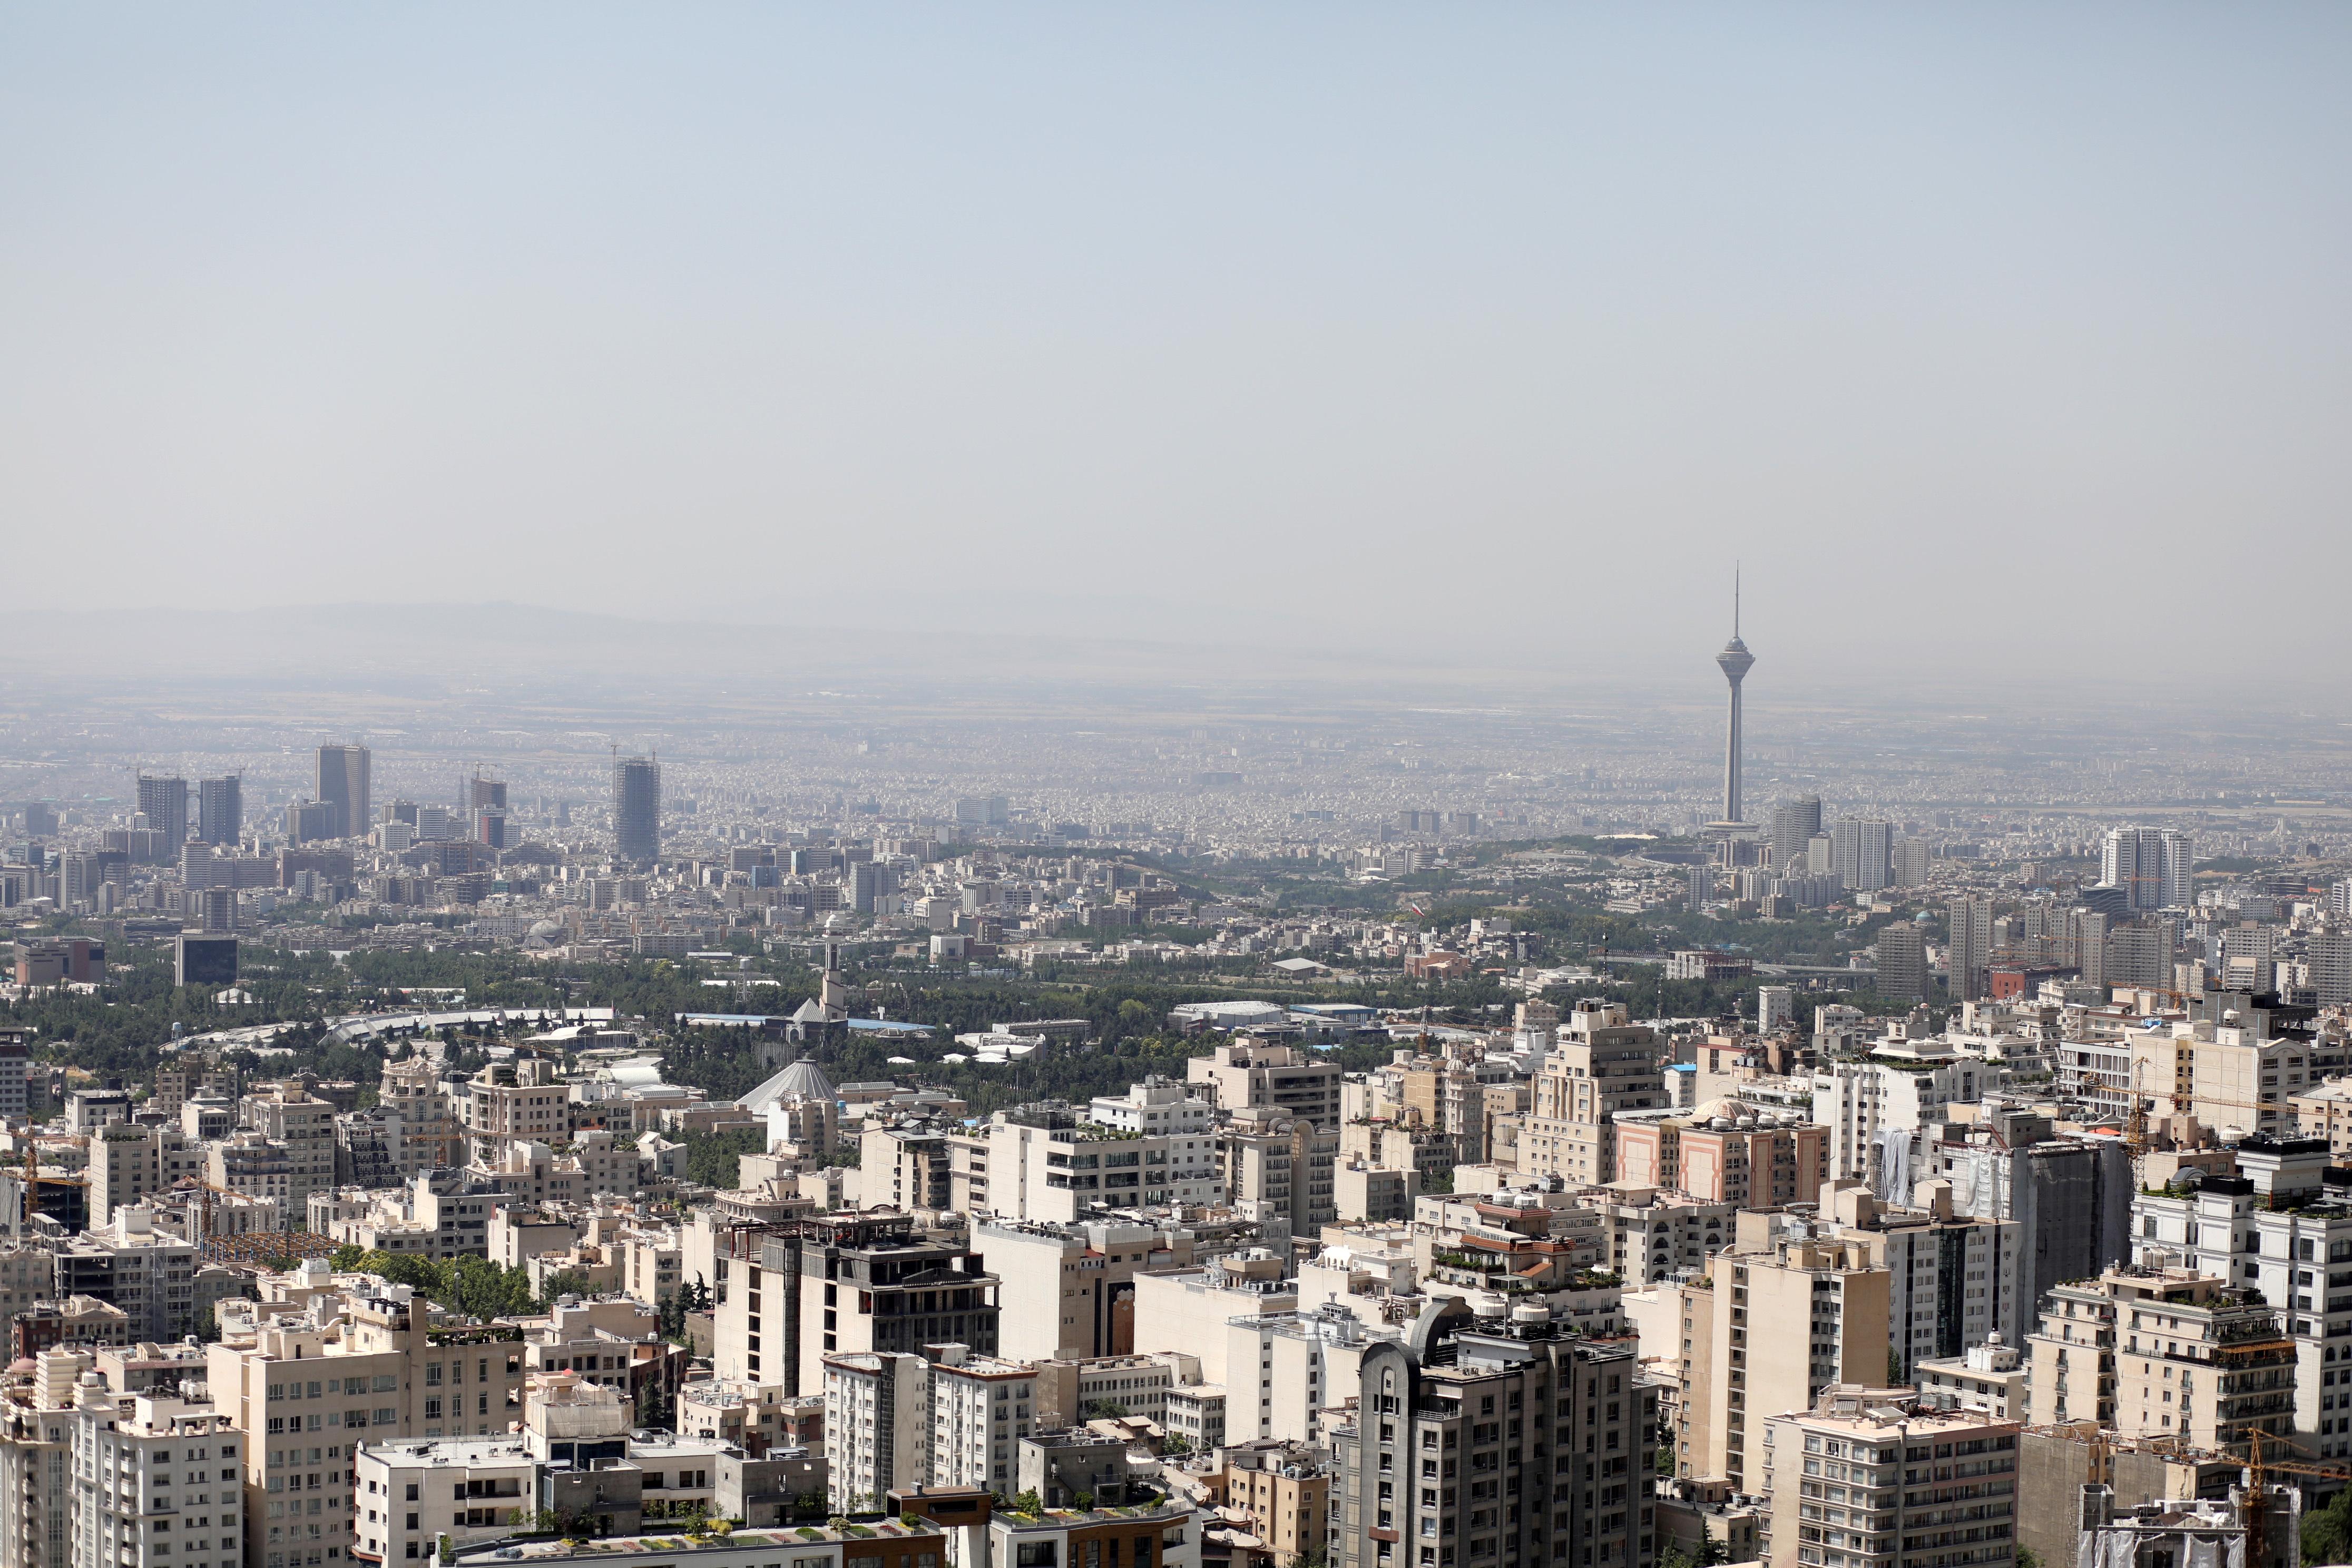 A general view of Tehran city, in Tehran, Iran June 12, 2020. Ali Khara/WANA (West Asia News Agency) via REUTERS